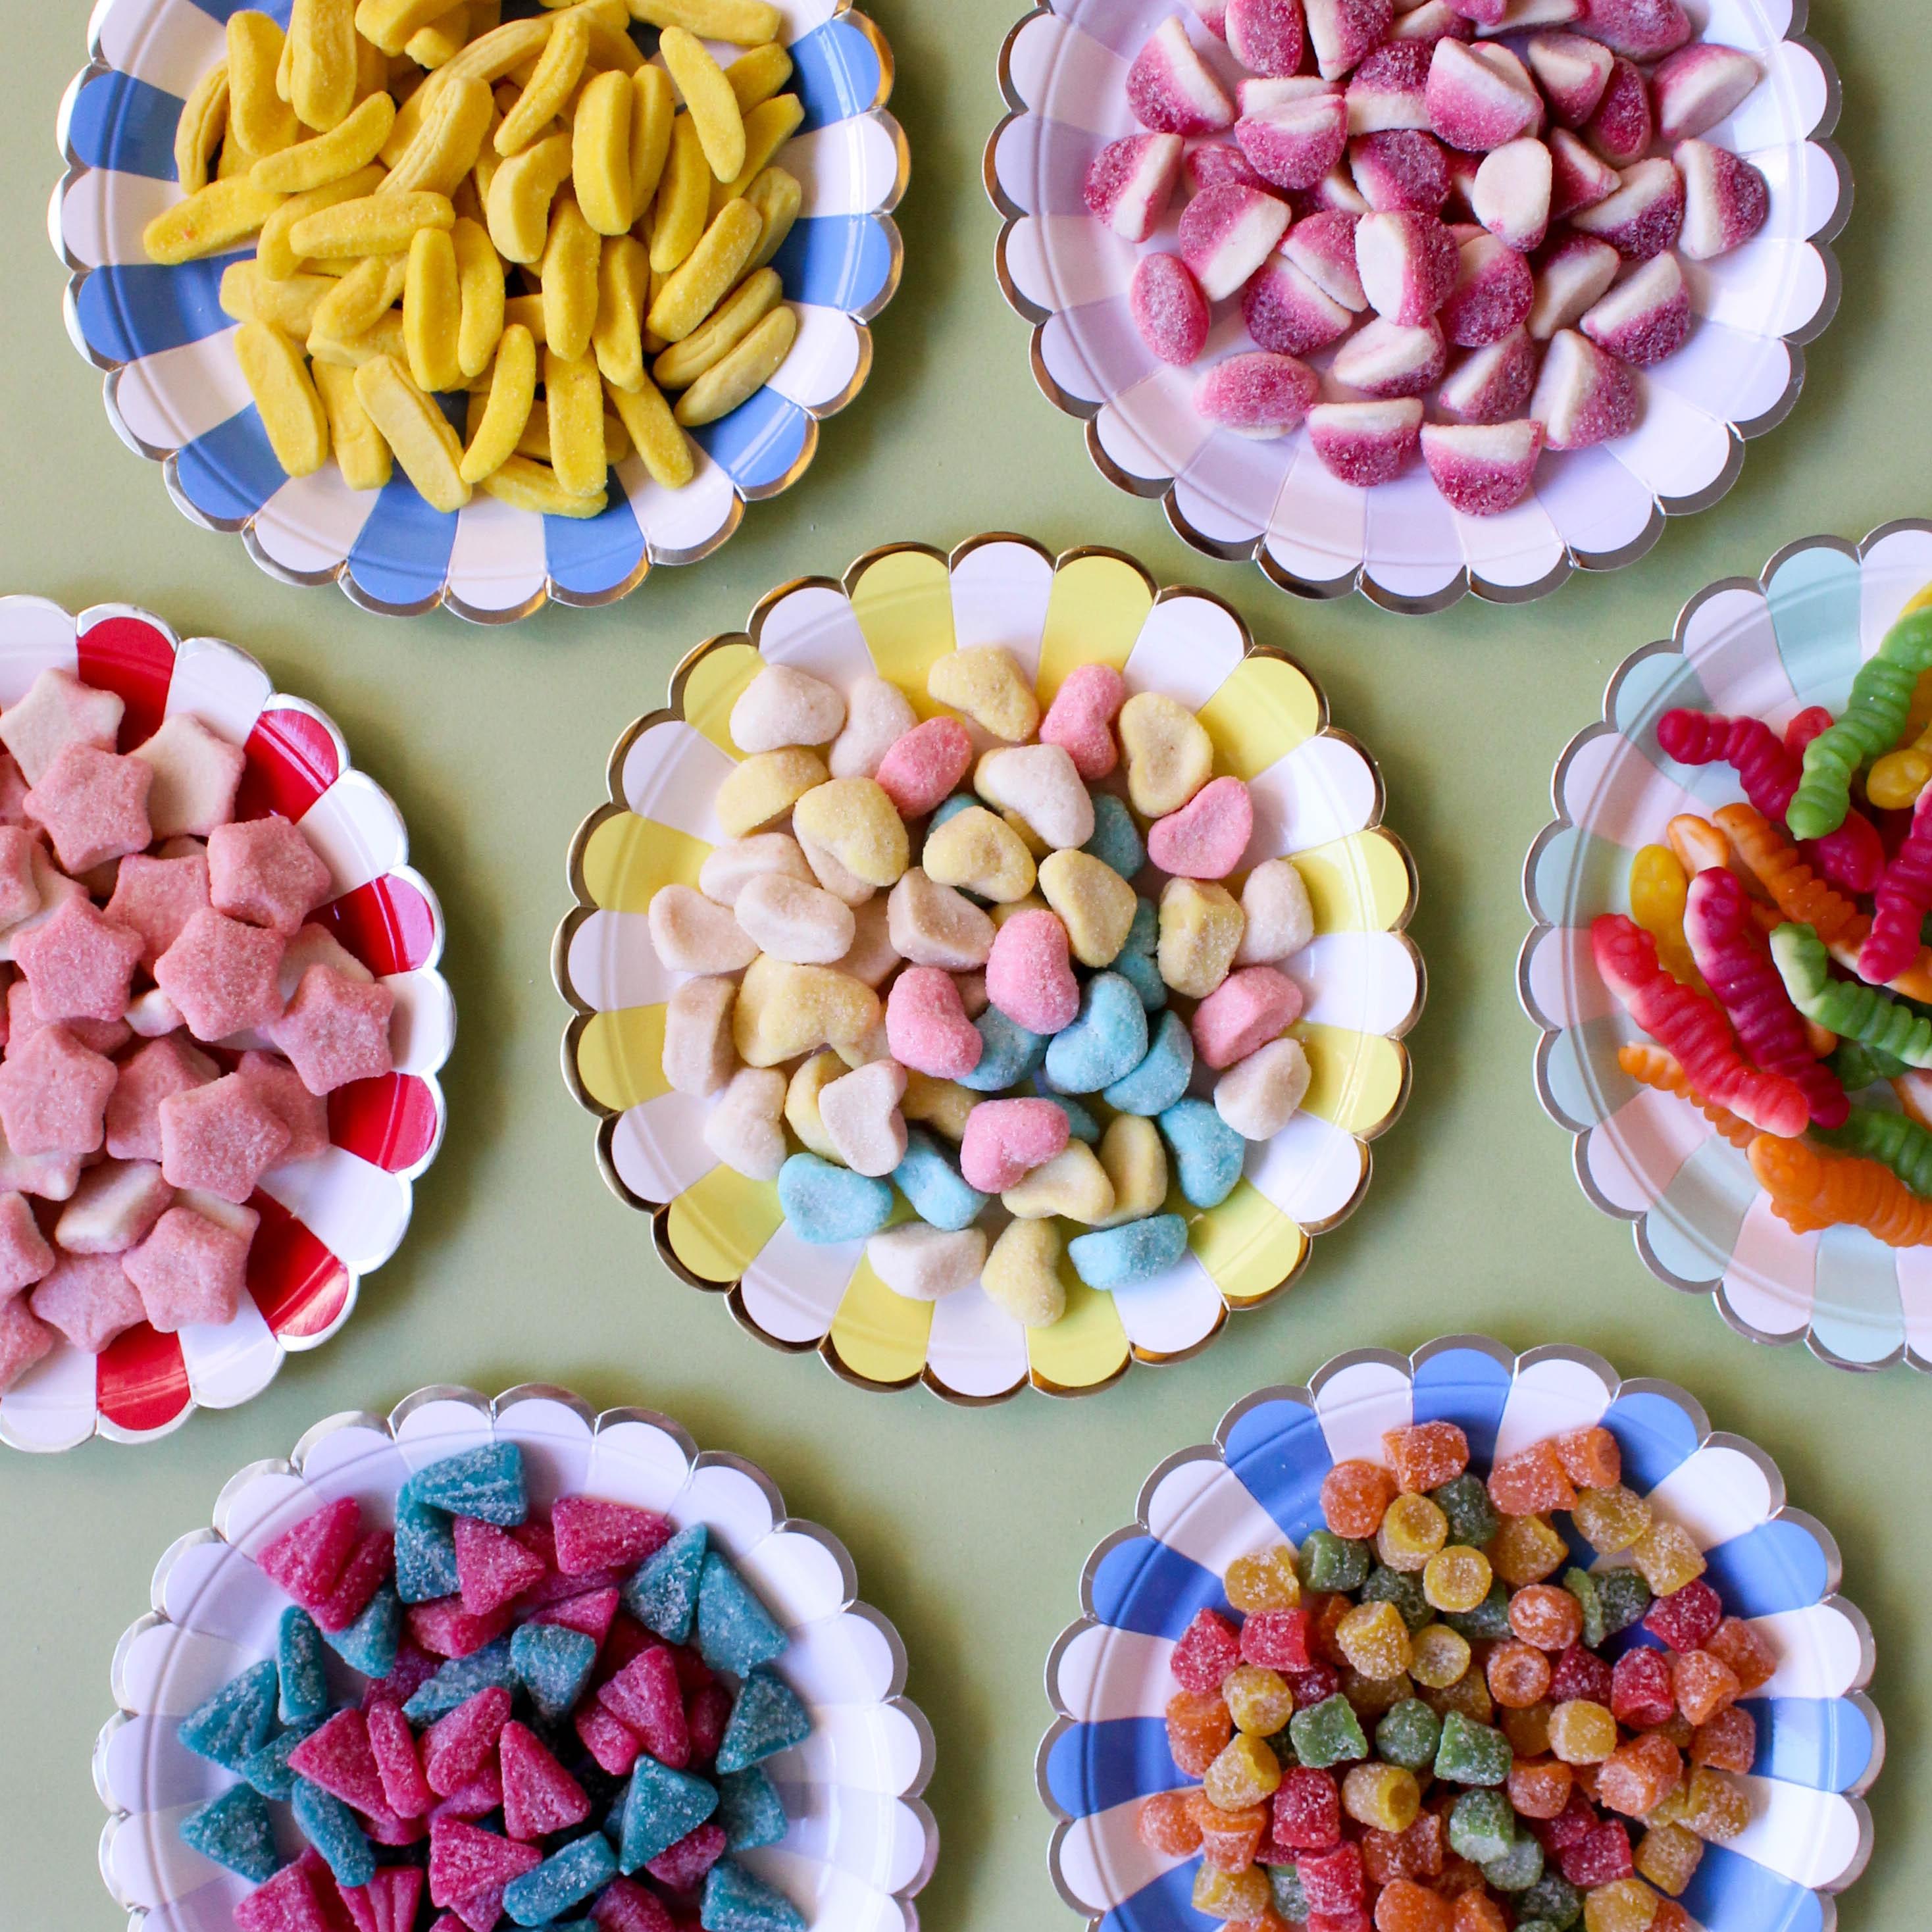 Sugar representating insulin sensitivity.